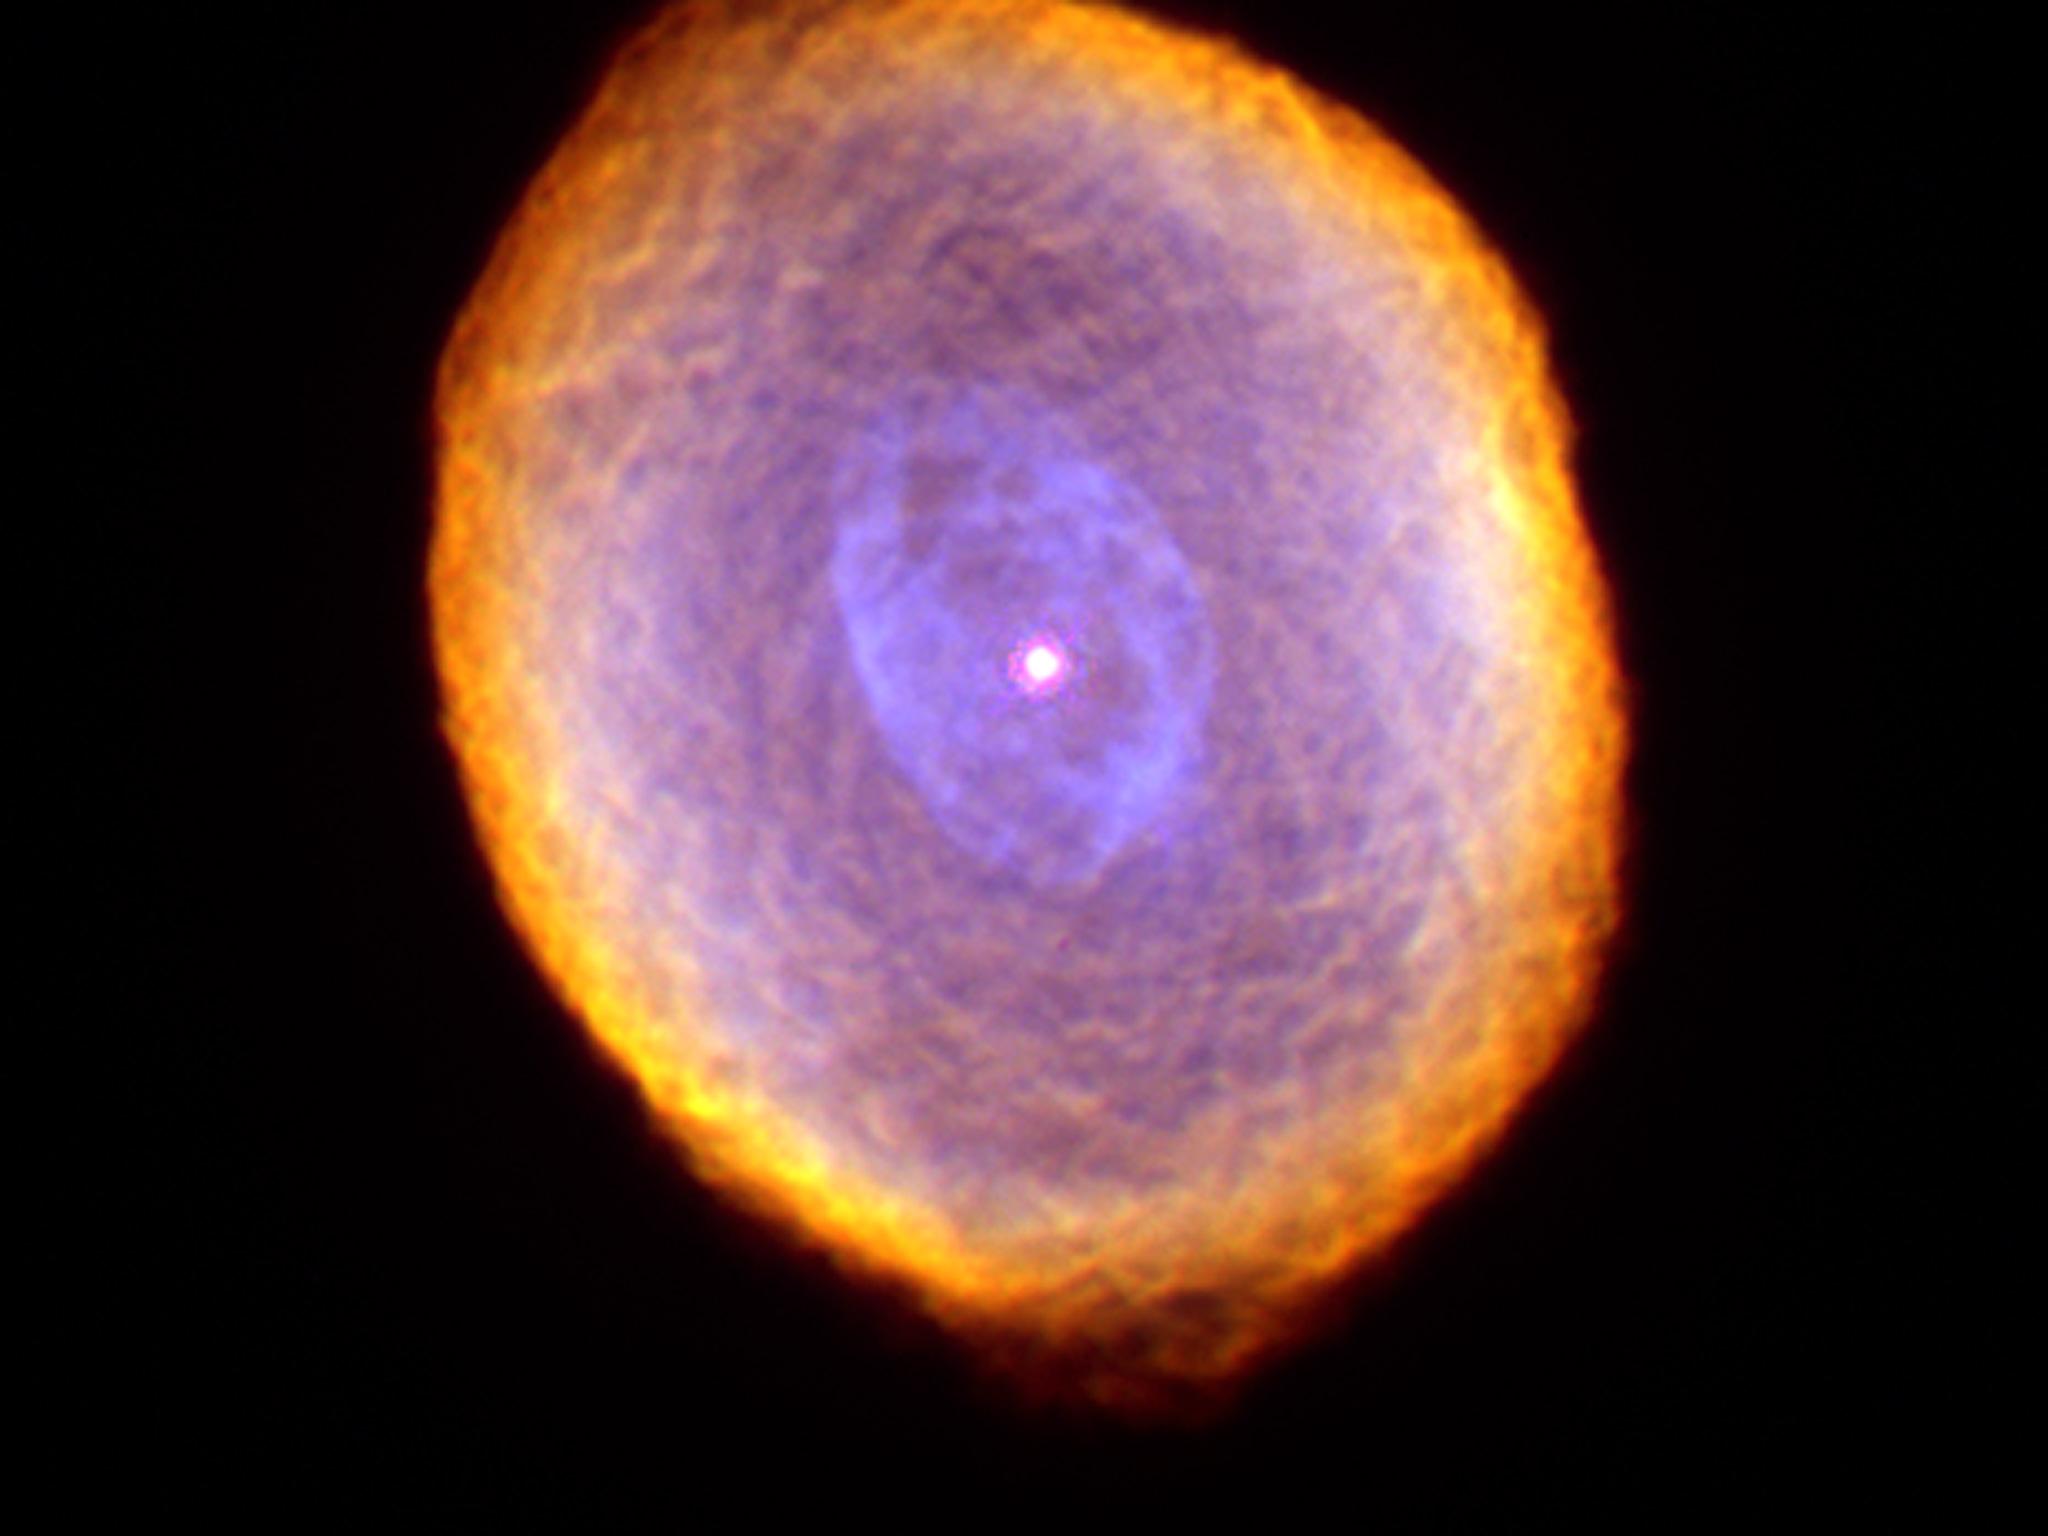 hubble telescope constellation - photo #41